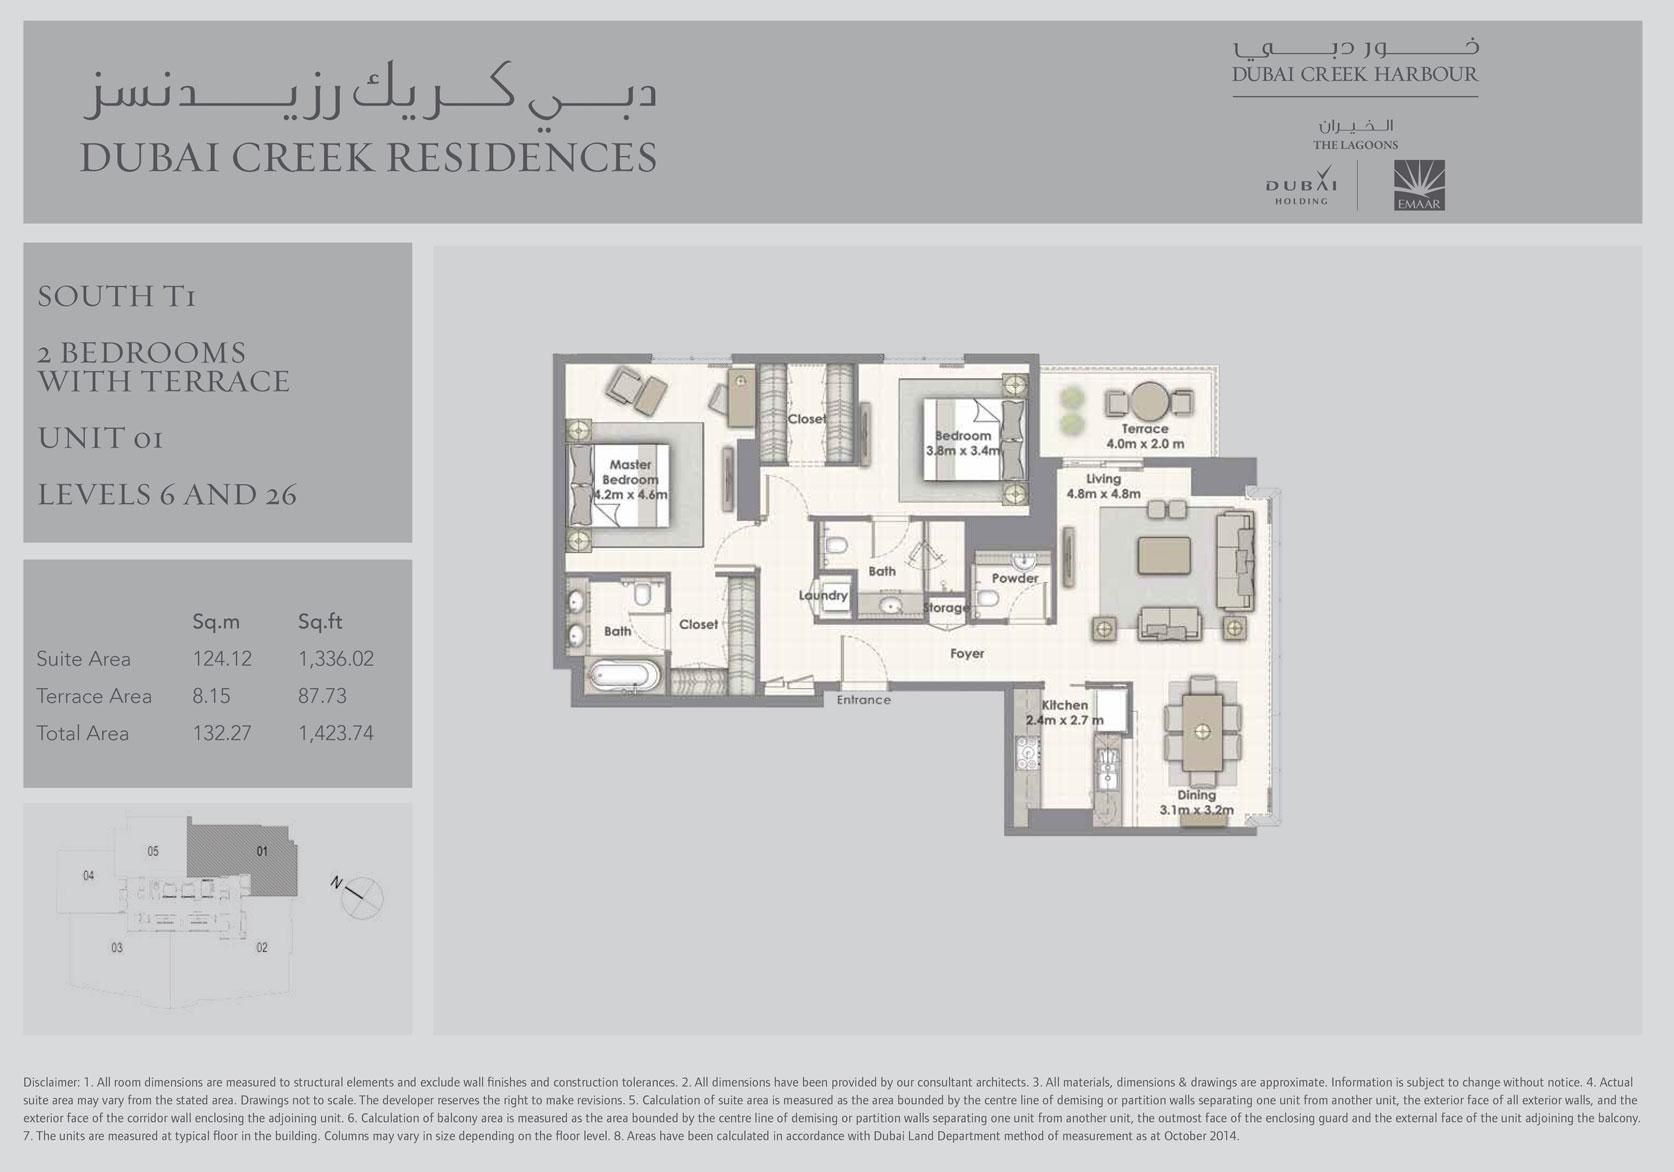 2 Bedroom With Rerrace